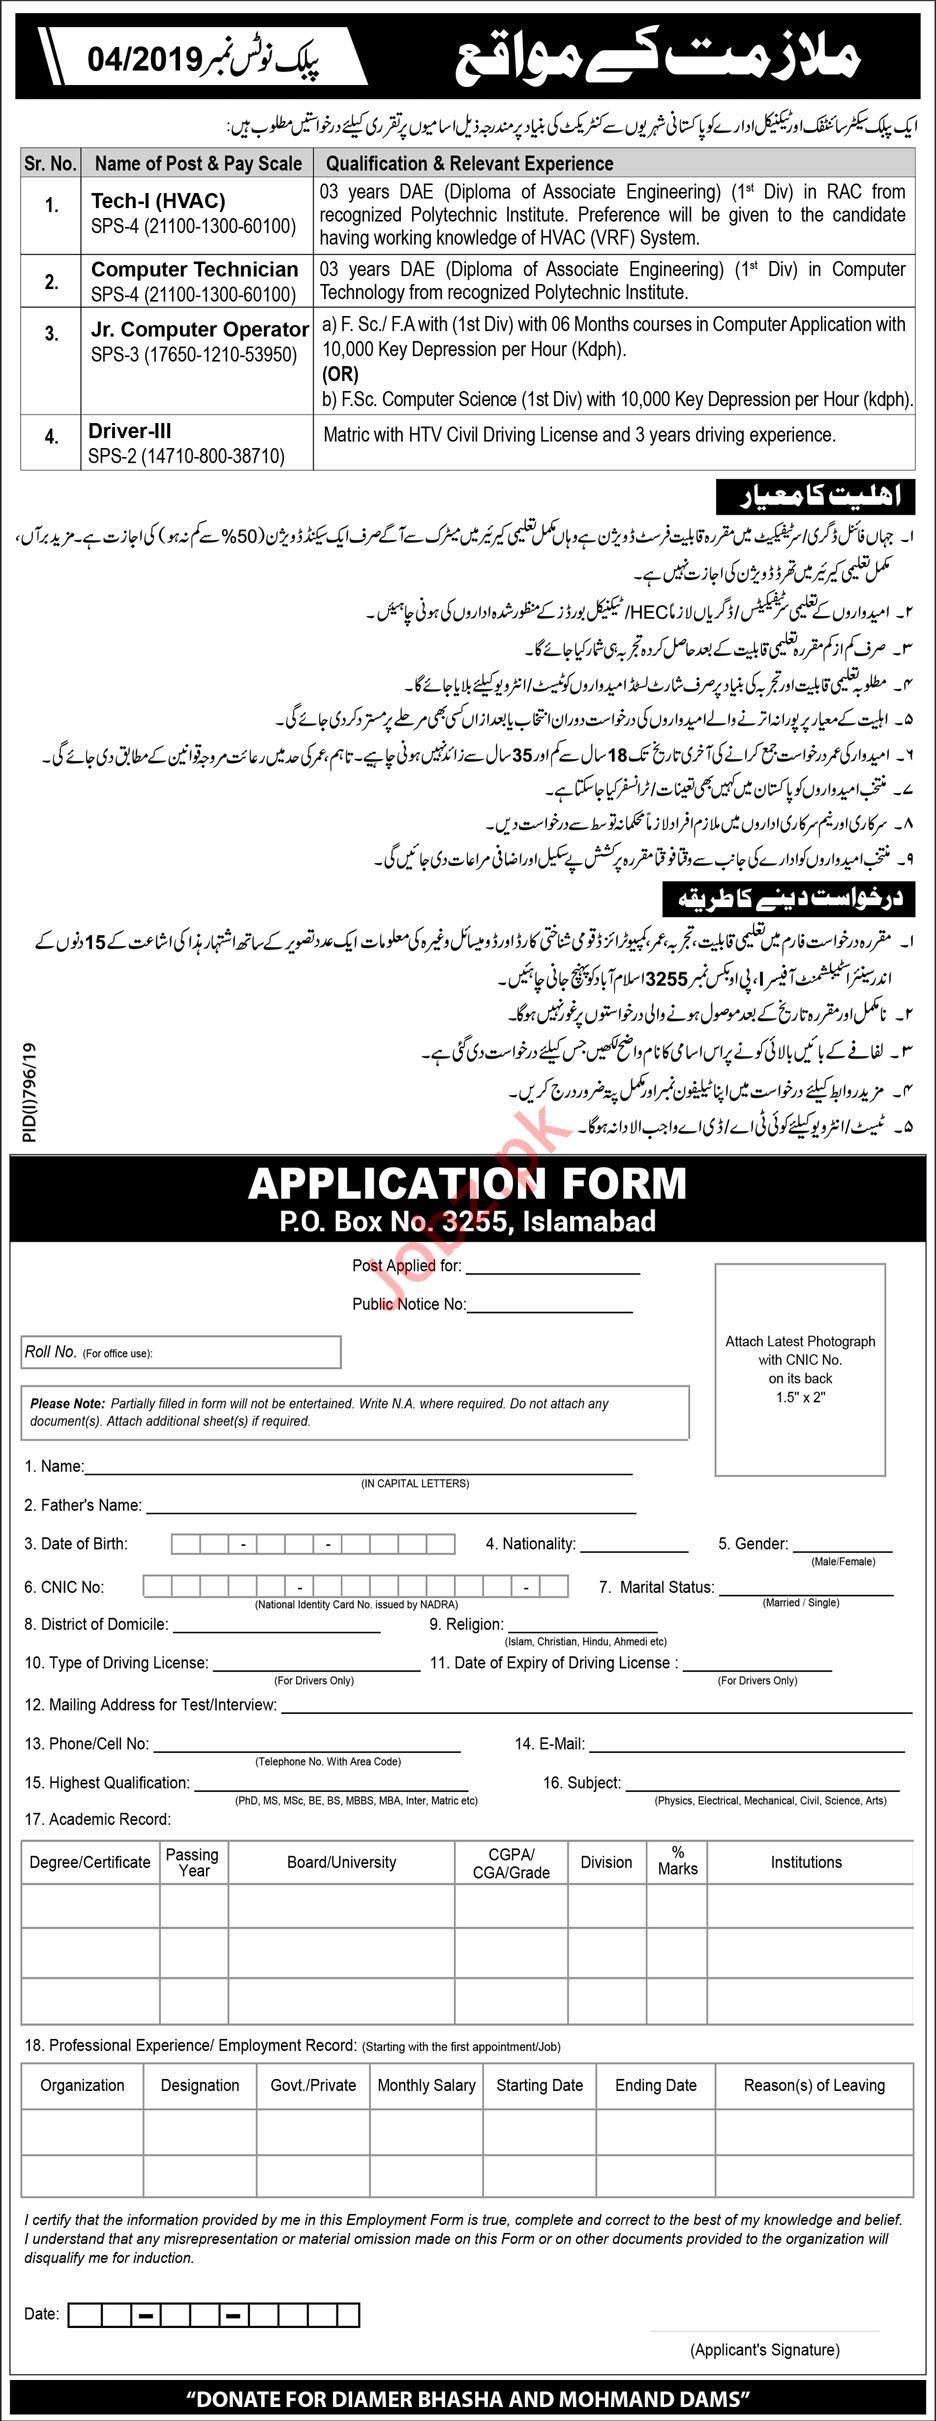 Pakistan Atomic Energy Commission PAEC Jobs 2019